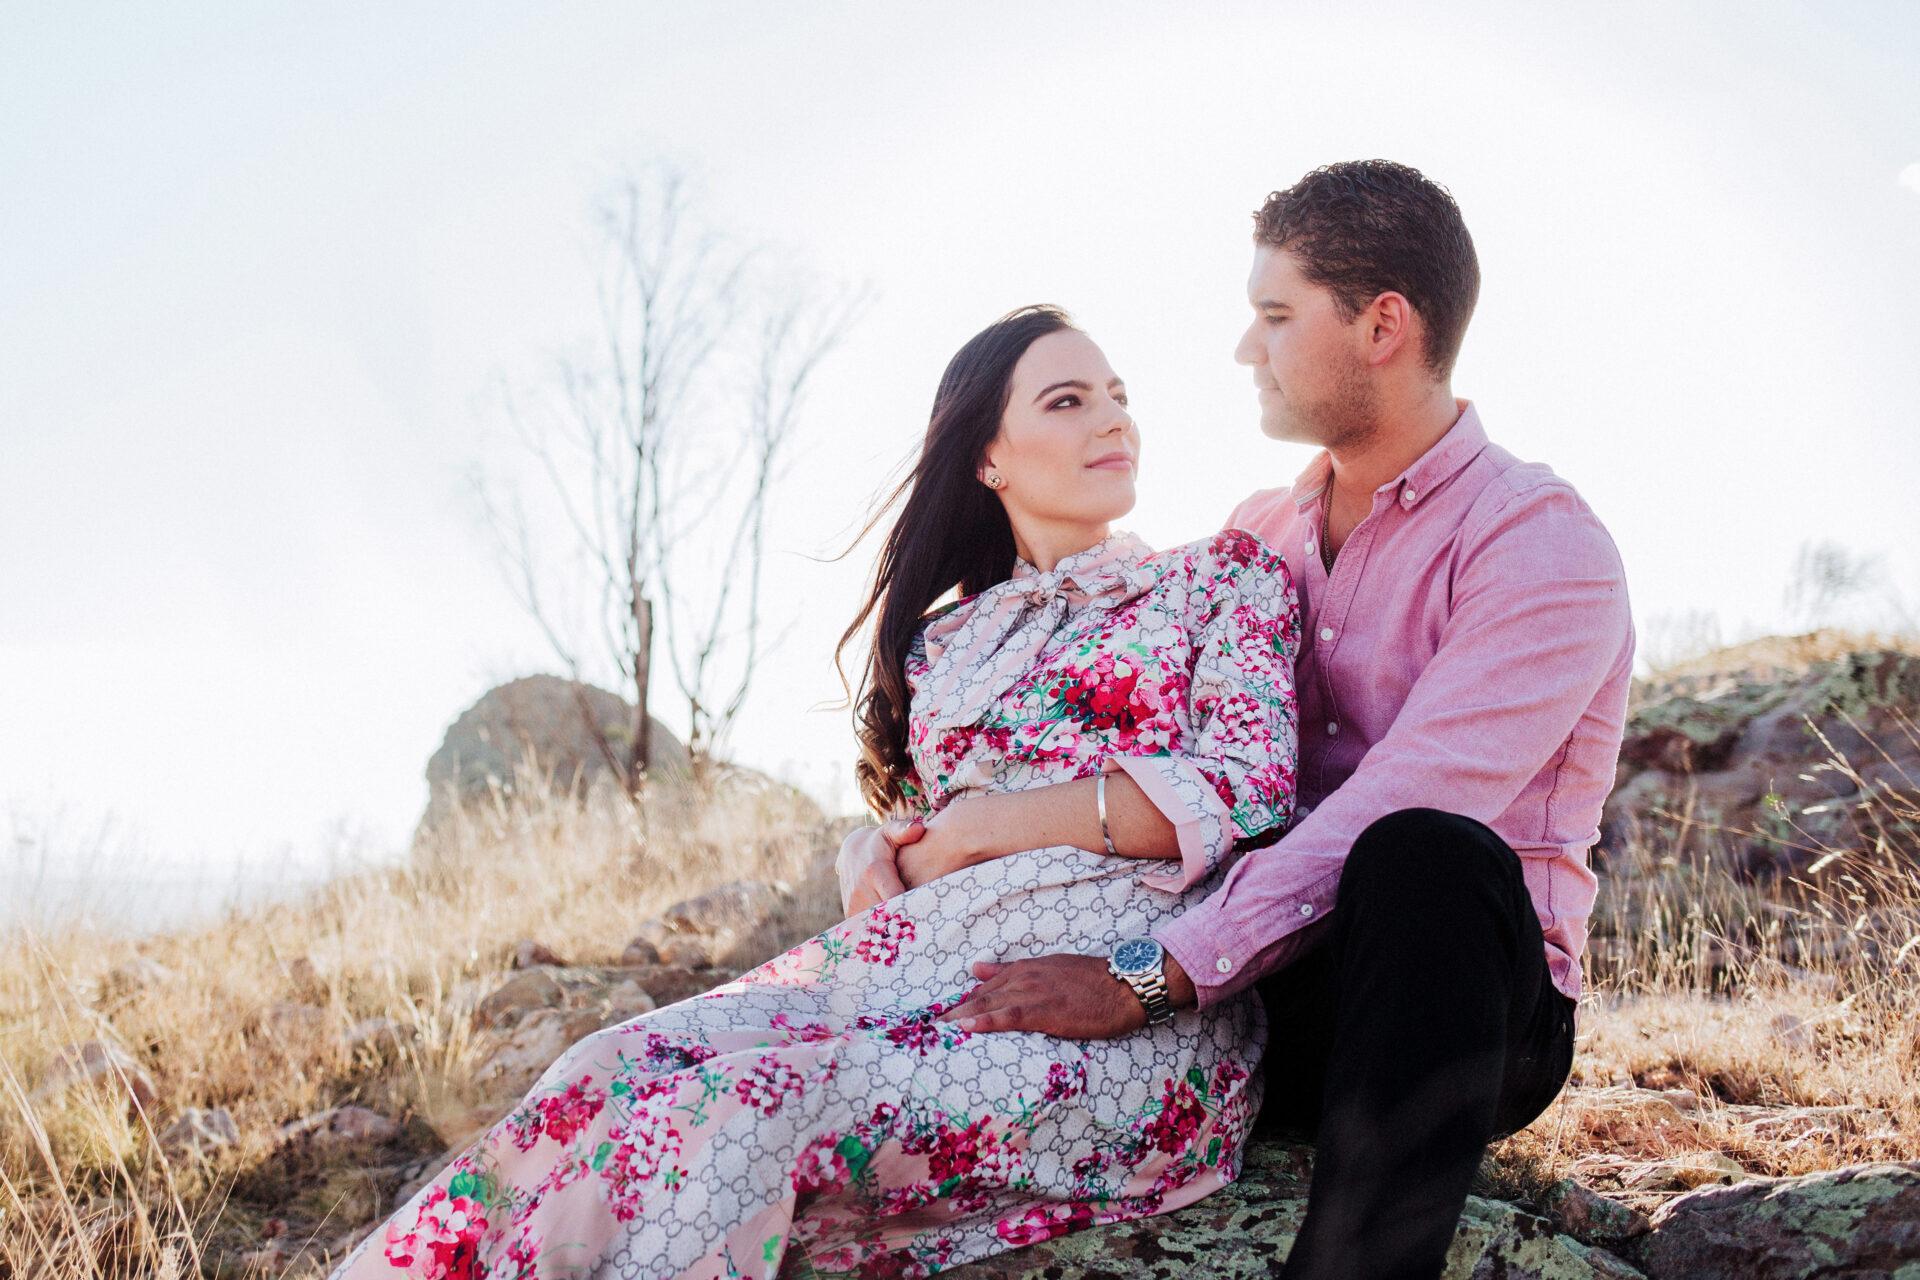 javier_noriega_fotografo_bodas_save_the_date_preboda_zacatecas_wedding_photographer8